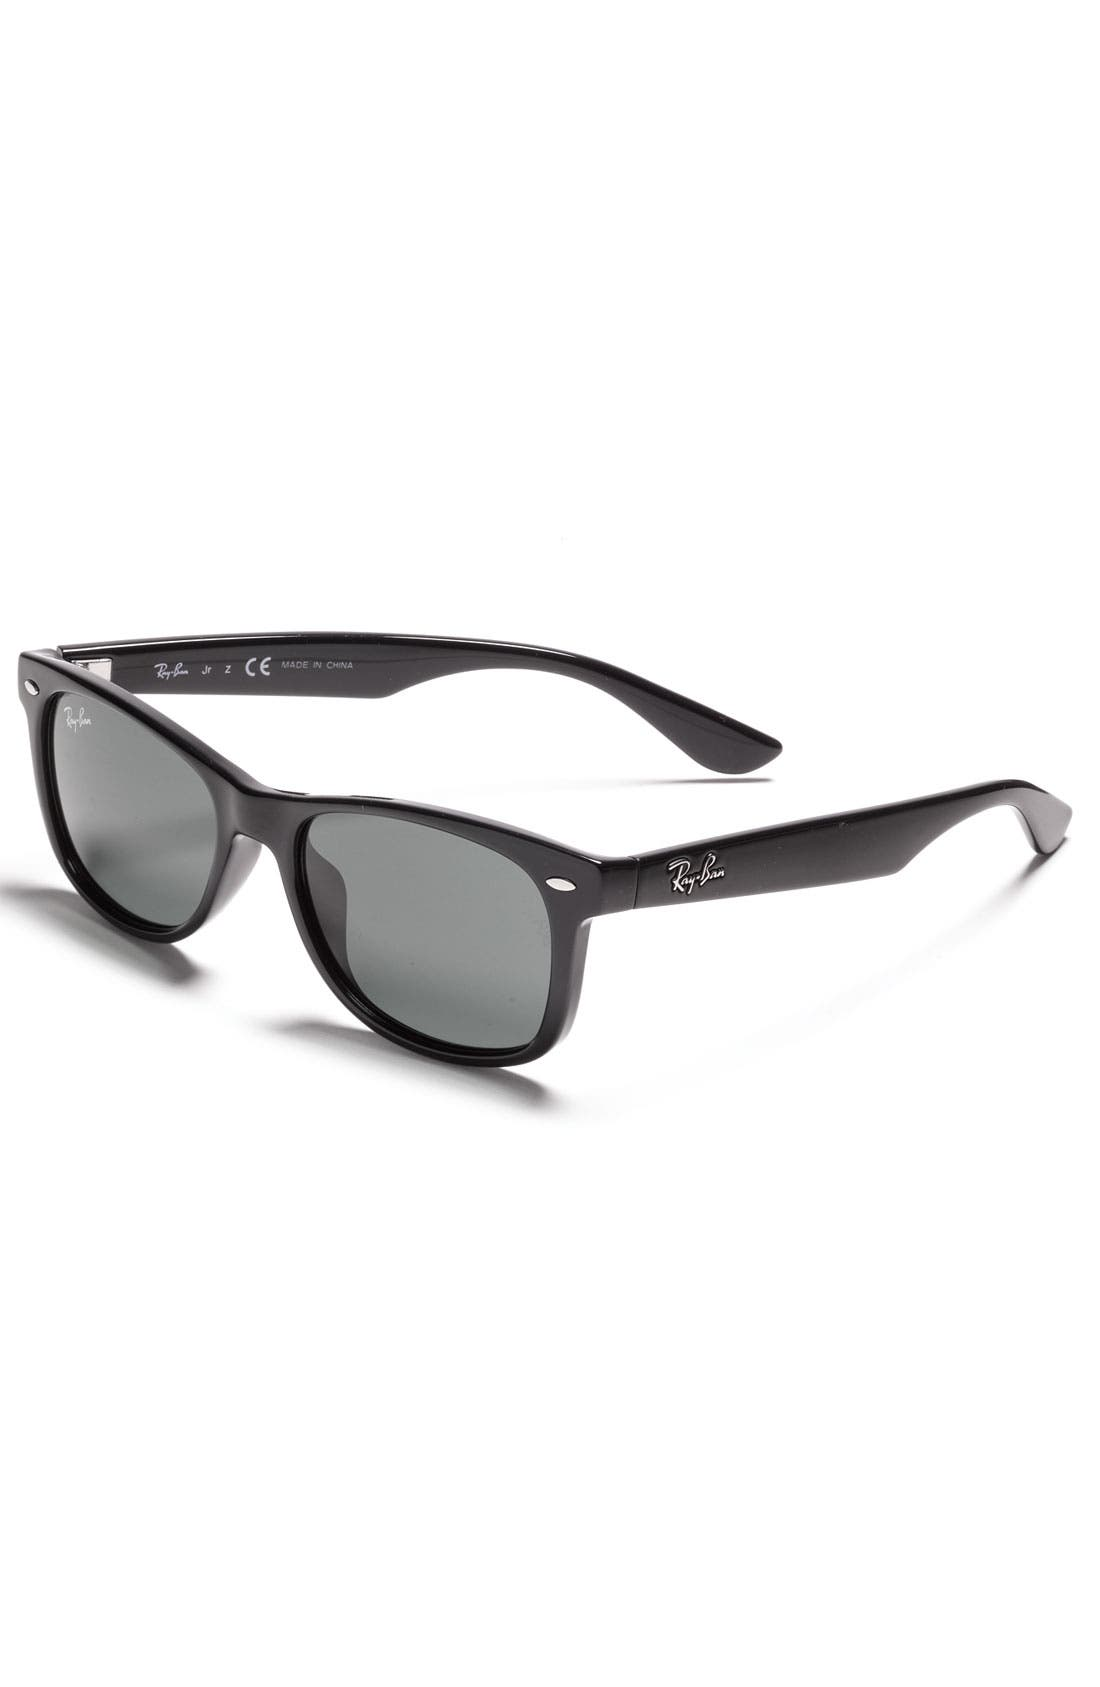 Alternate Image 1 Selected - Ray-Ban Wayfarer 47mm Sunglasses (Big Boys)